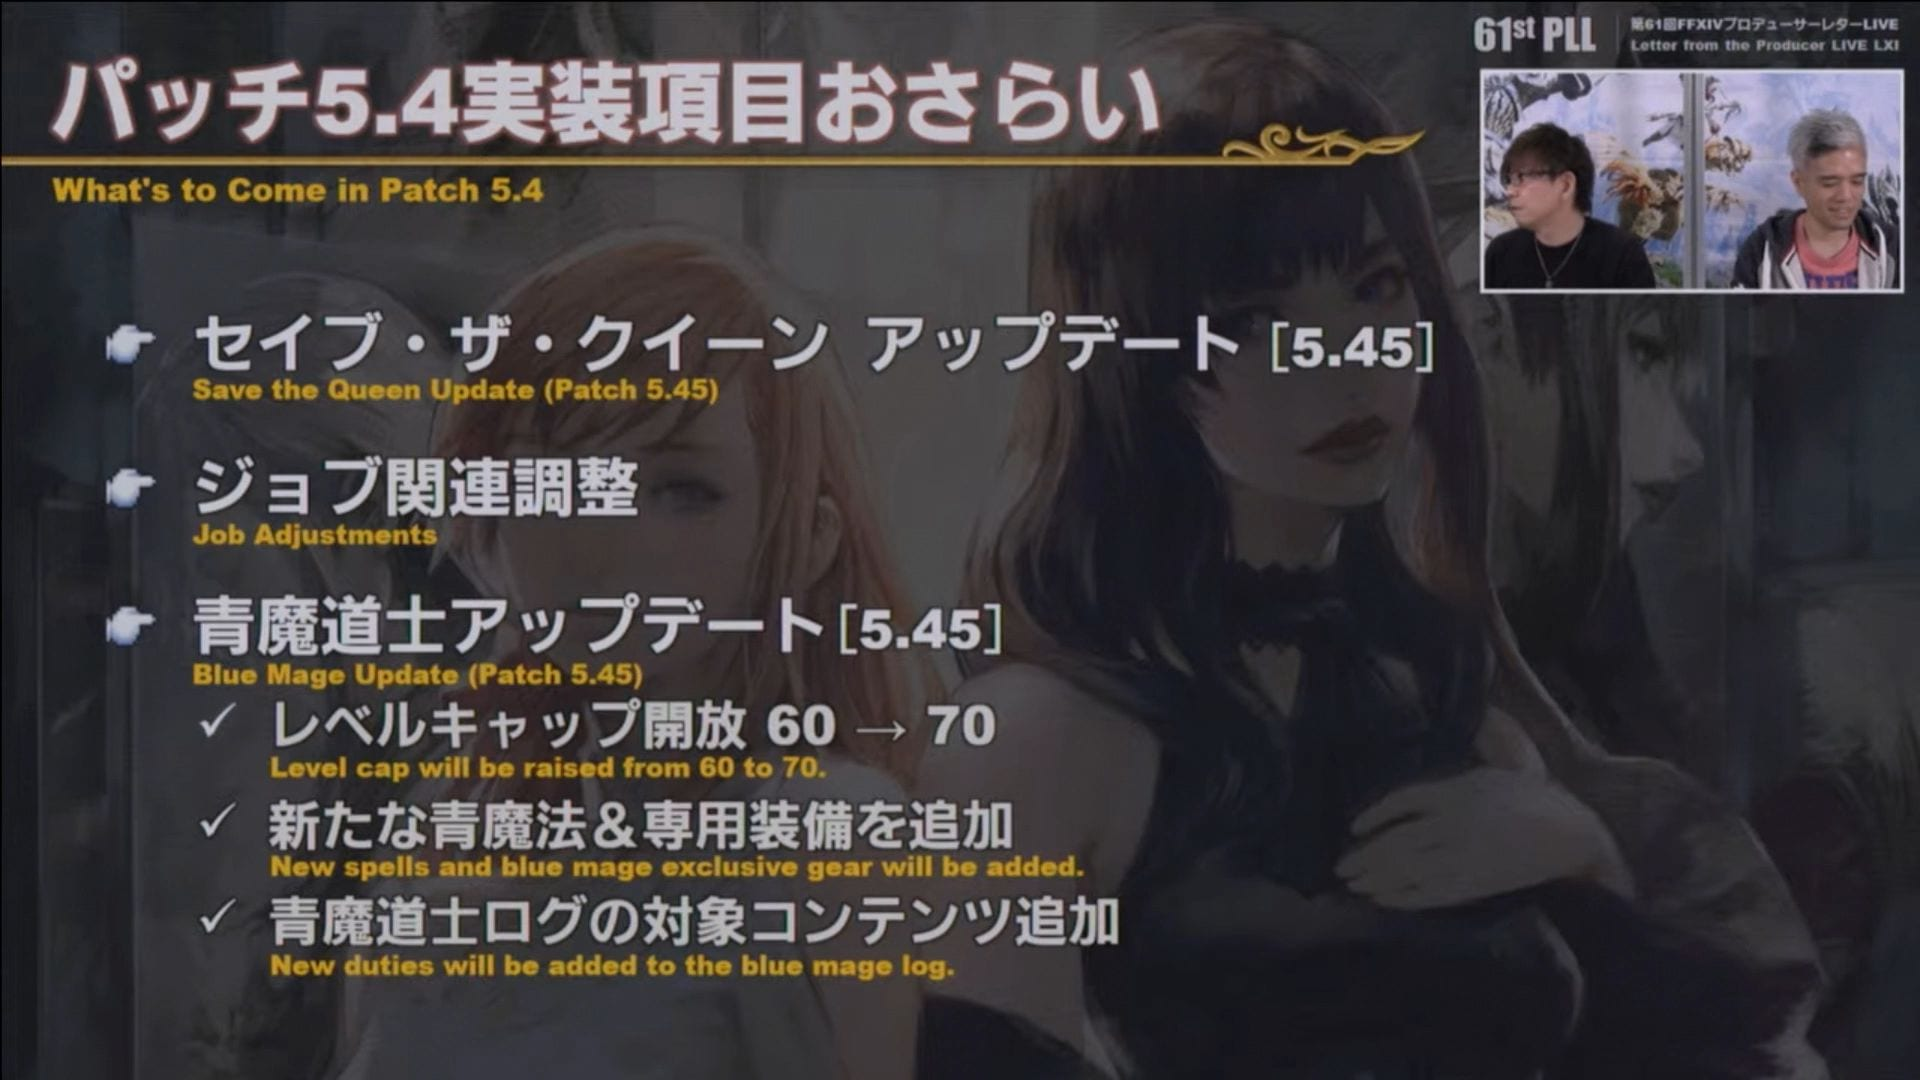 Final-Fantasy-XIV-Screenshot-2020-11-27-13-14-23.jpg